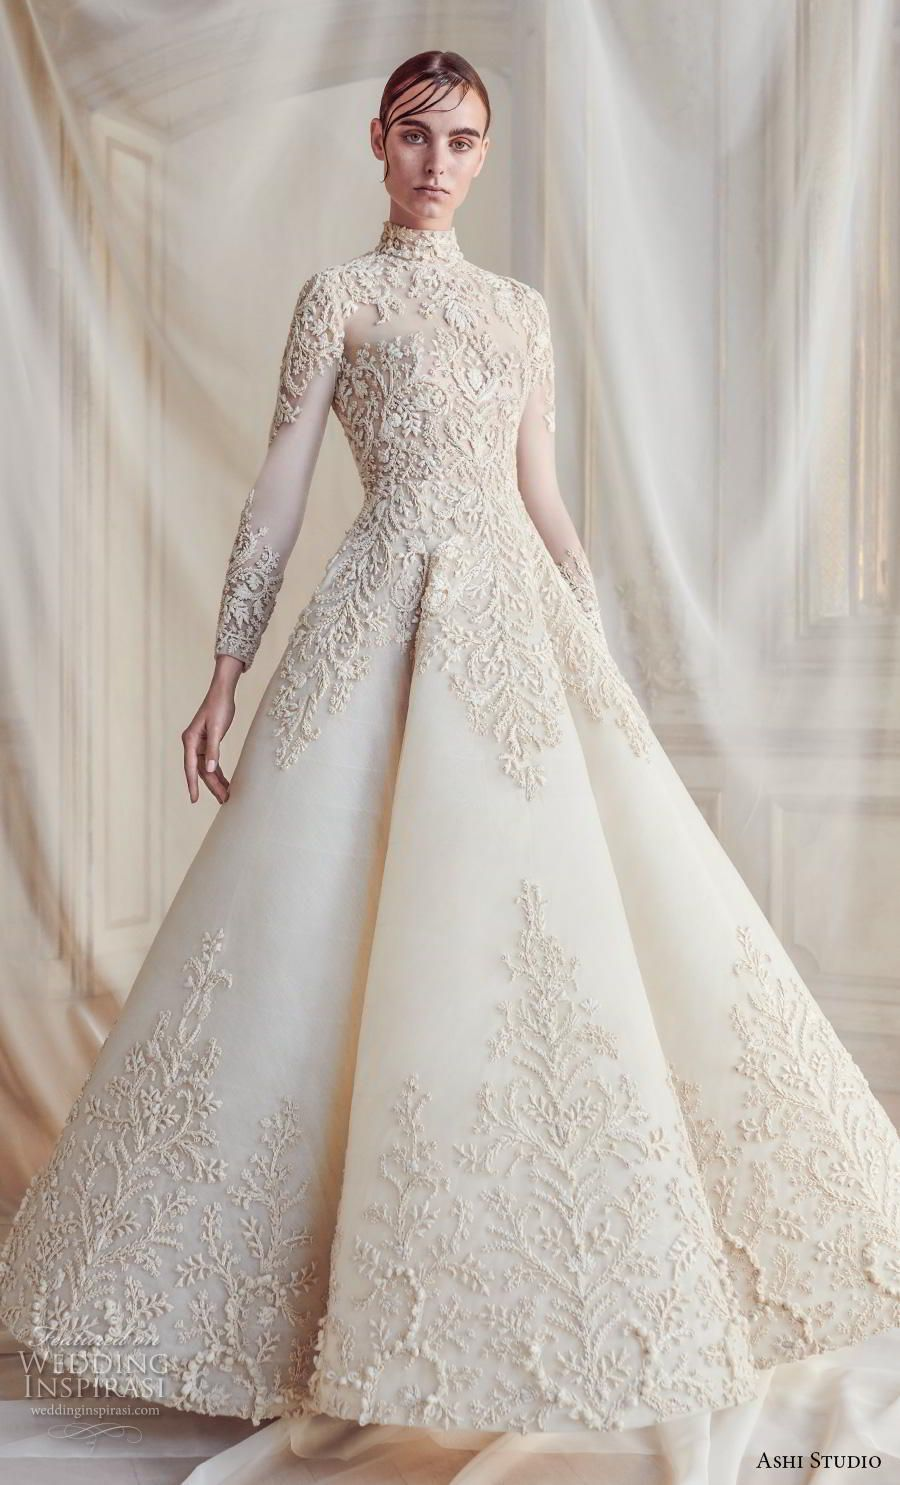 Ashi Studio Fall Winter 2019 Bridal Long Sleeves High Neck Full Embellishment Glamorous A Lin Modest Wedding Dresses Ball Gown Wedding Dress Beautiful Dresses